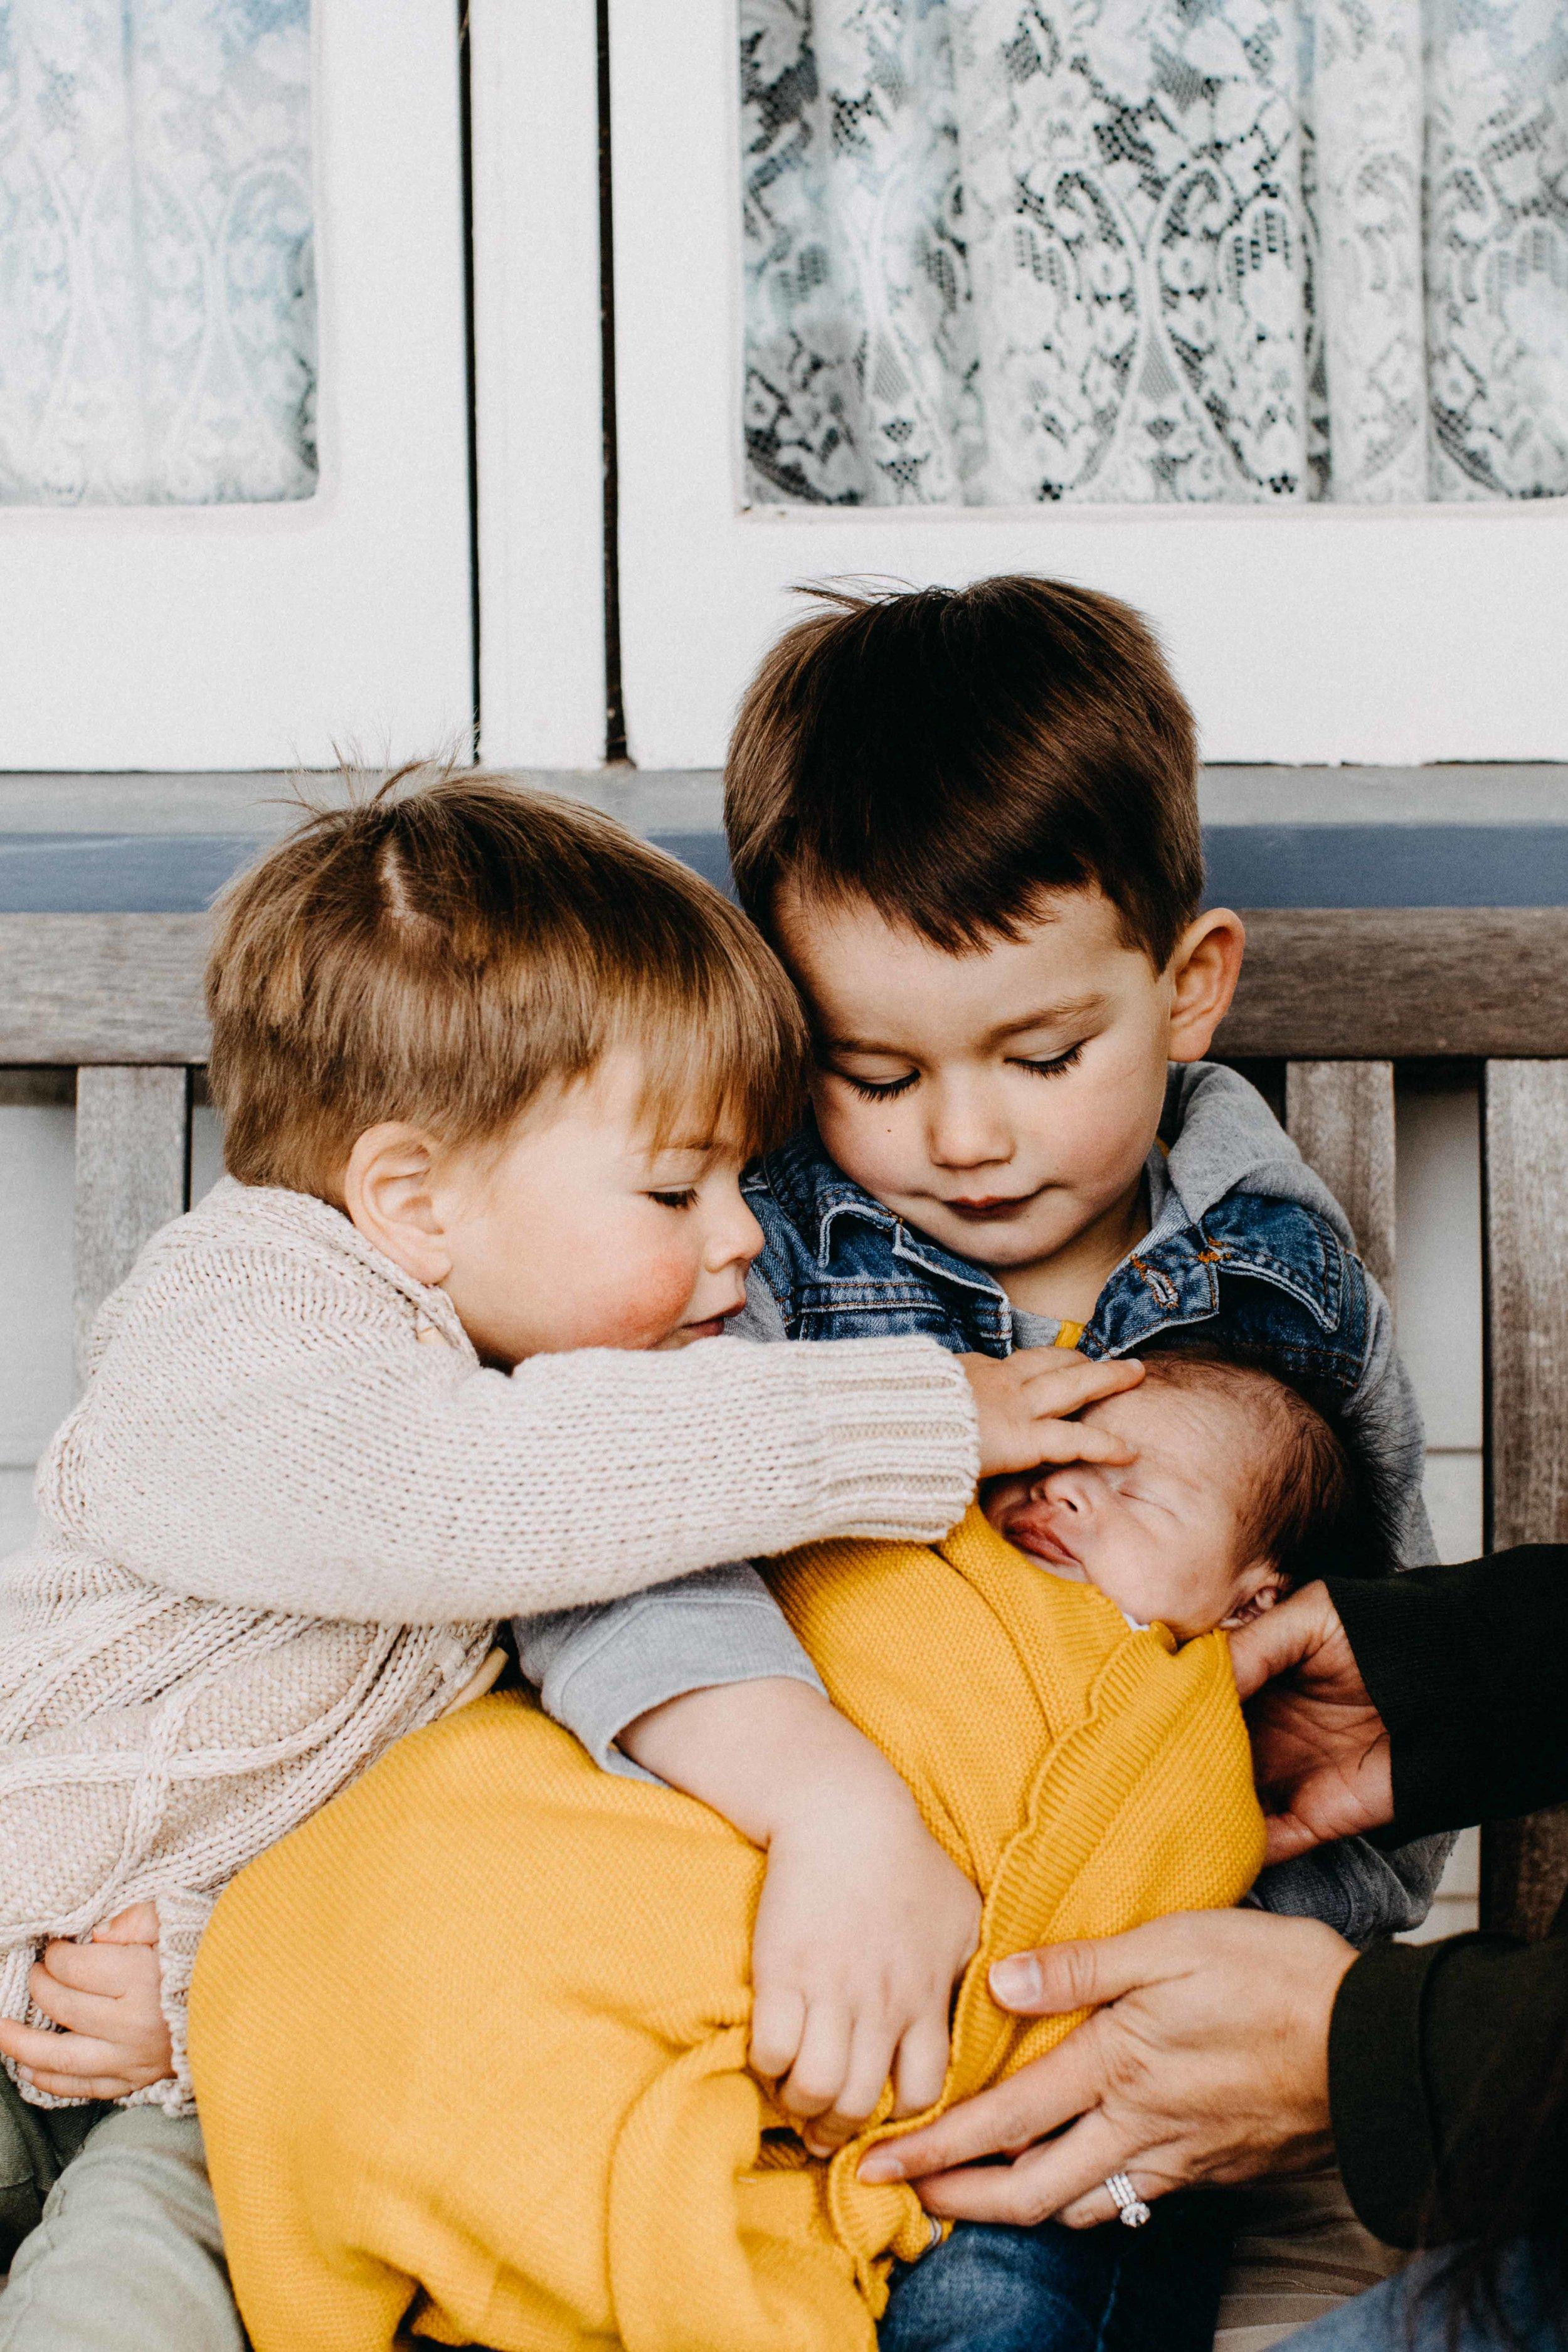 poppy-newborn-the-oaks-family-photographer-www.emilyobrienphotography.net-18.jpg